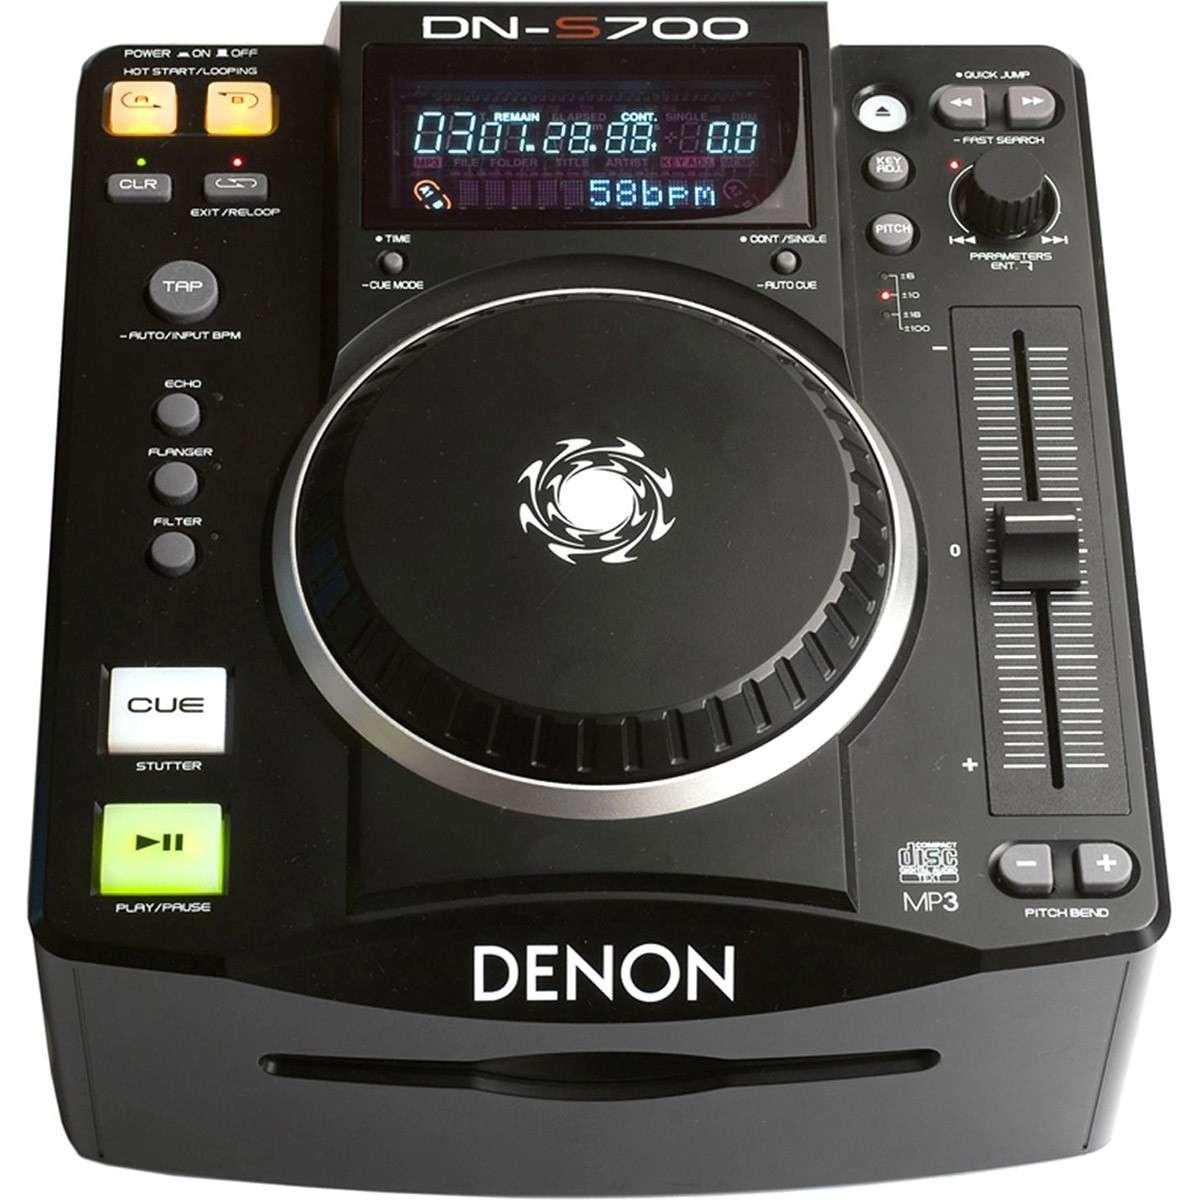 Denon DN-S700 CDJ Player Profissional Dj, 220v